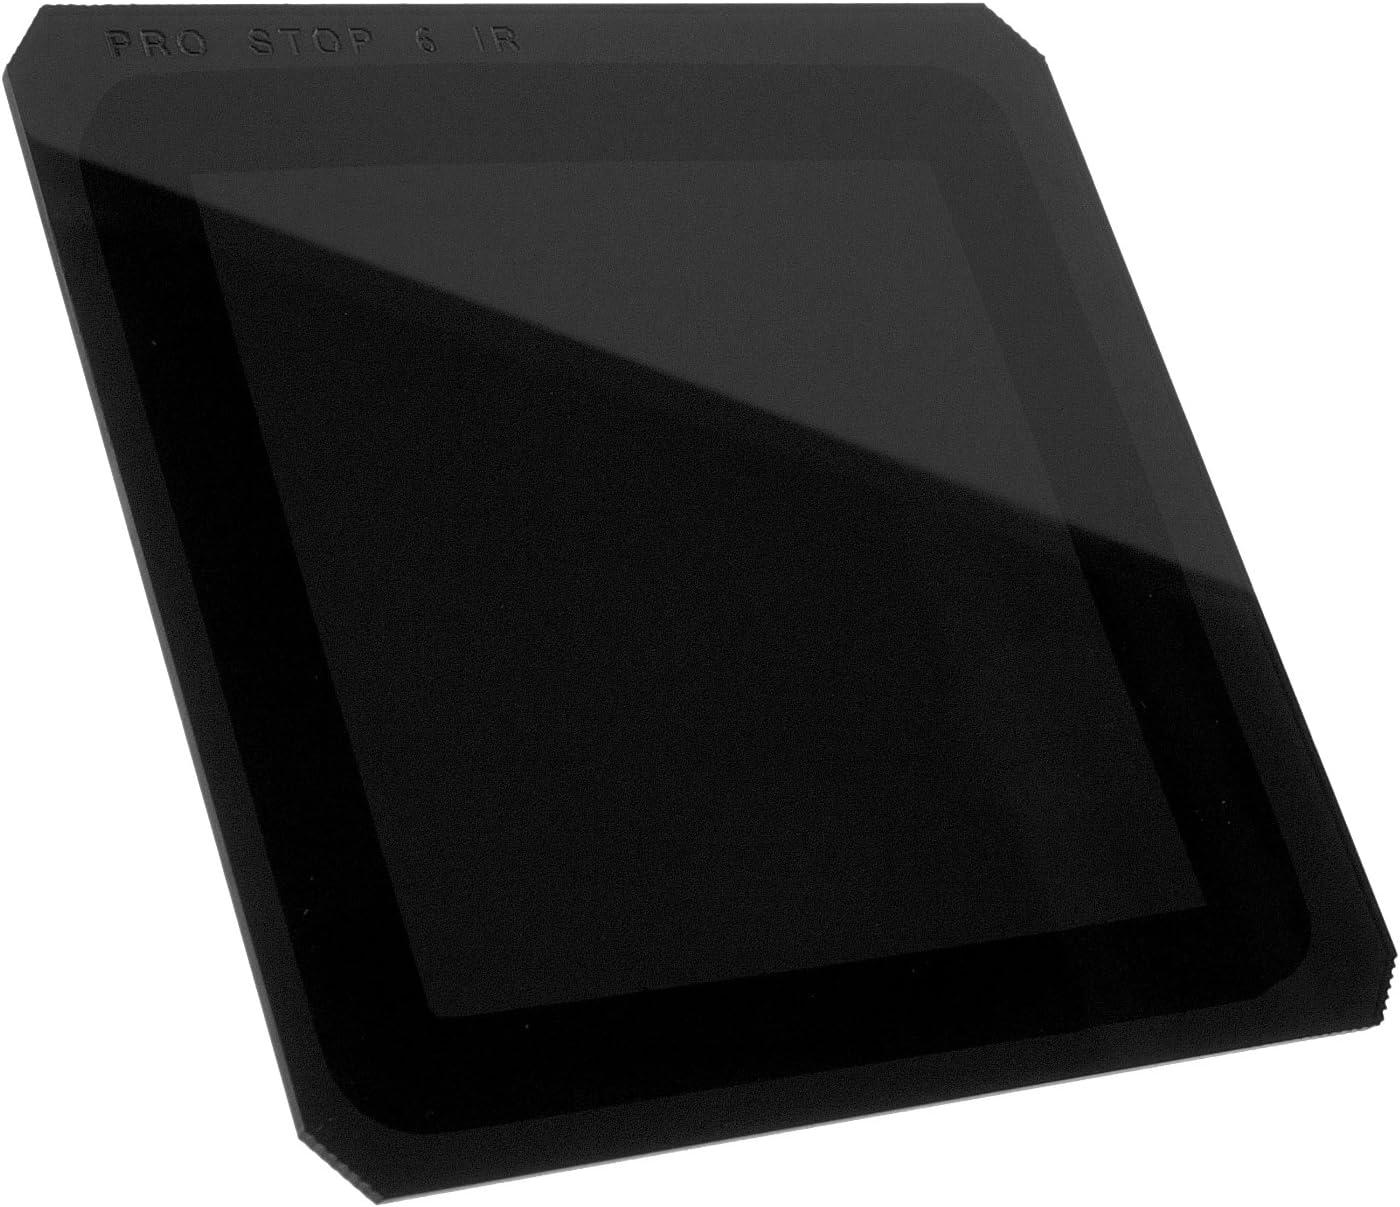 Hitech 100 ProStop 5 IR 1.5mm IRND 100x100